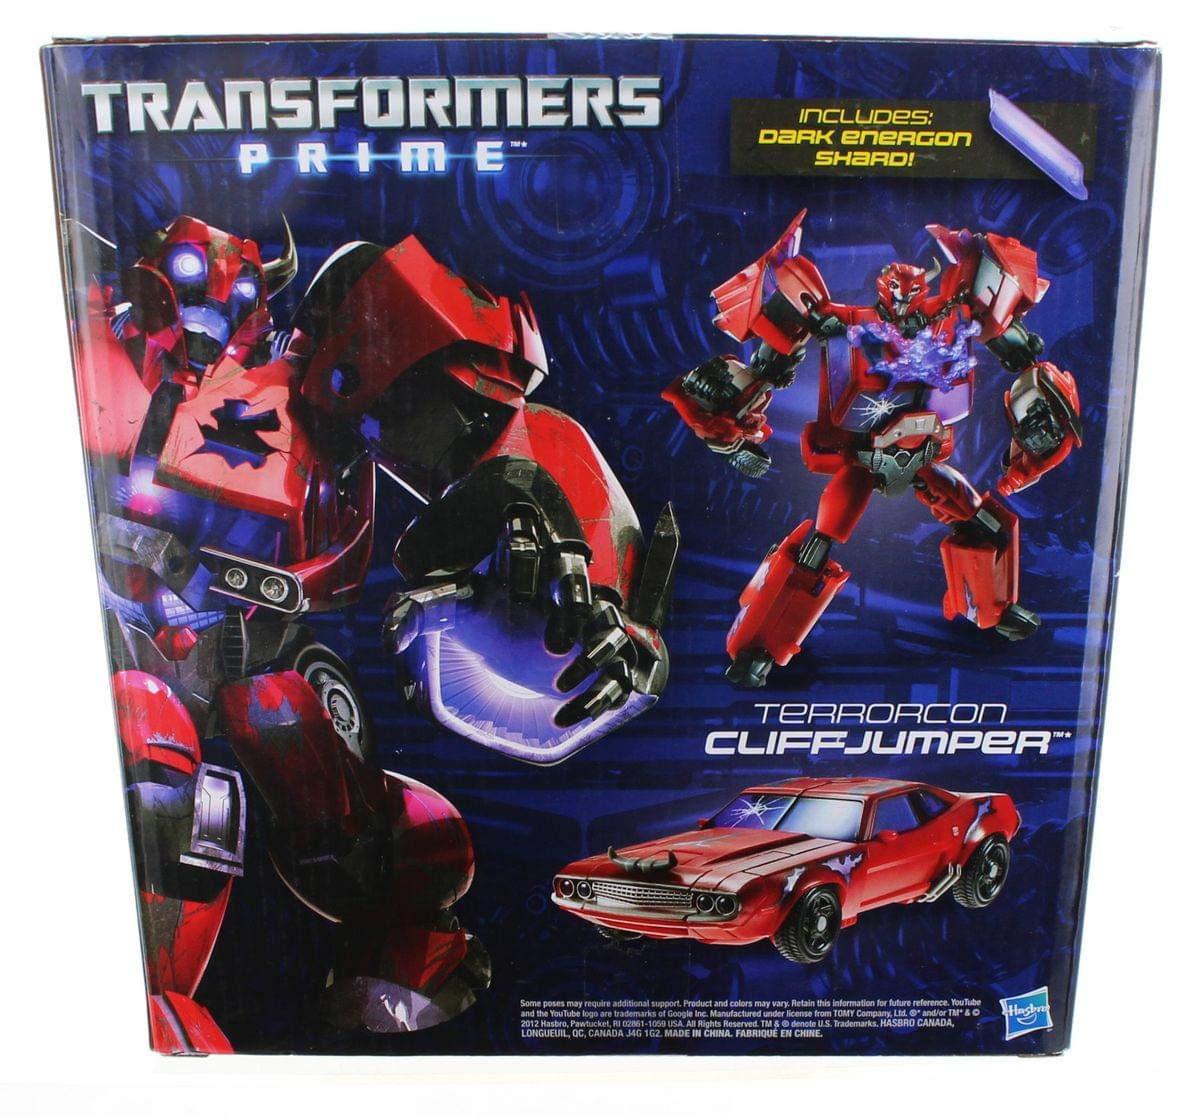 Hasbro Transformers 2012 SDCC Comic Con Exclusive Prime Deluxe Action Figure Rust in Peace Terrorcon Cliffjumper Hasbro Toys 653569778462